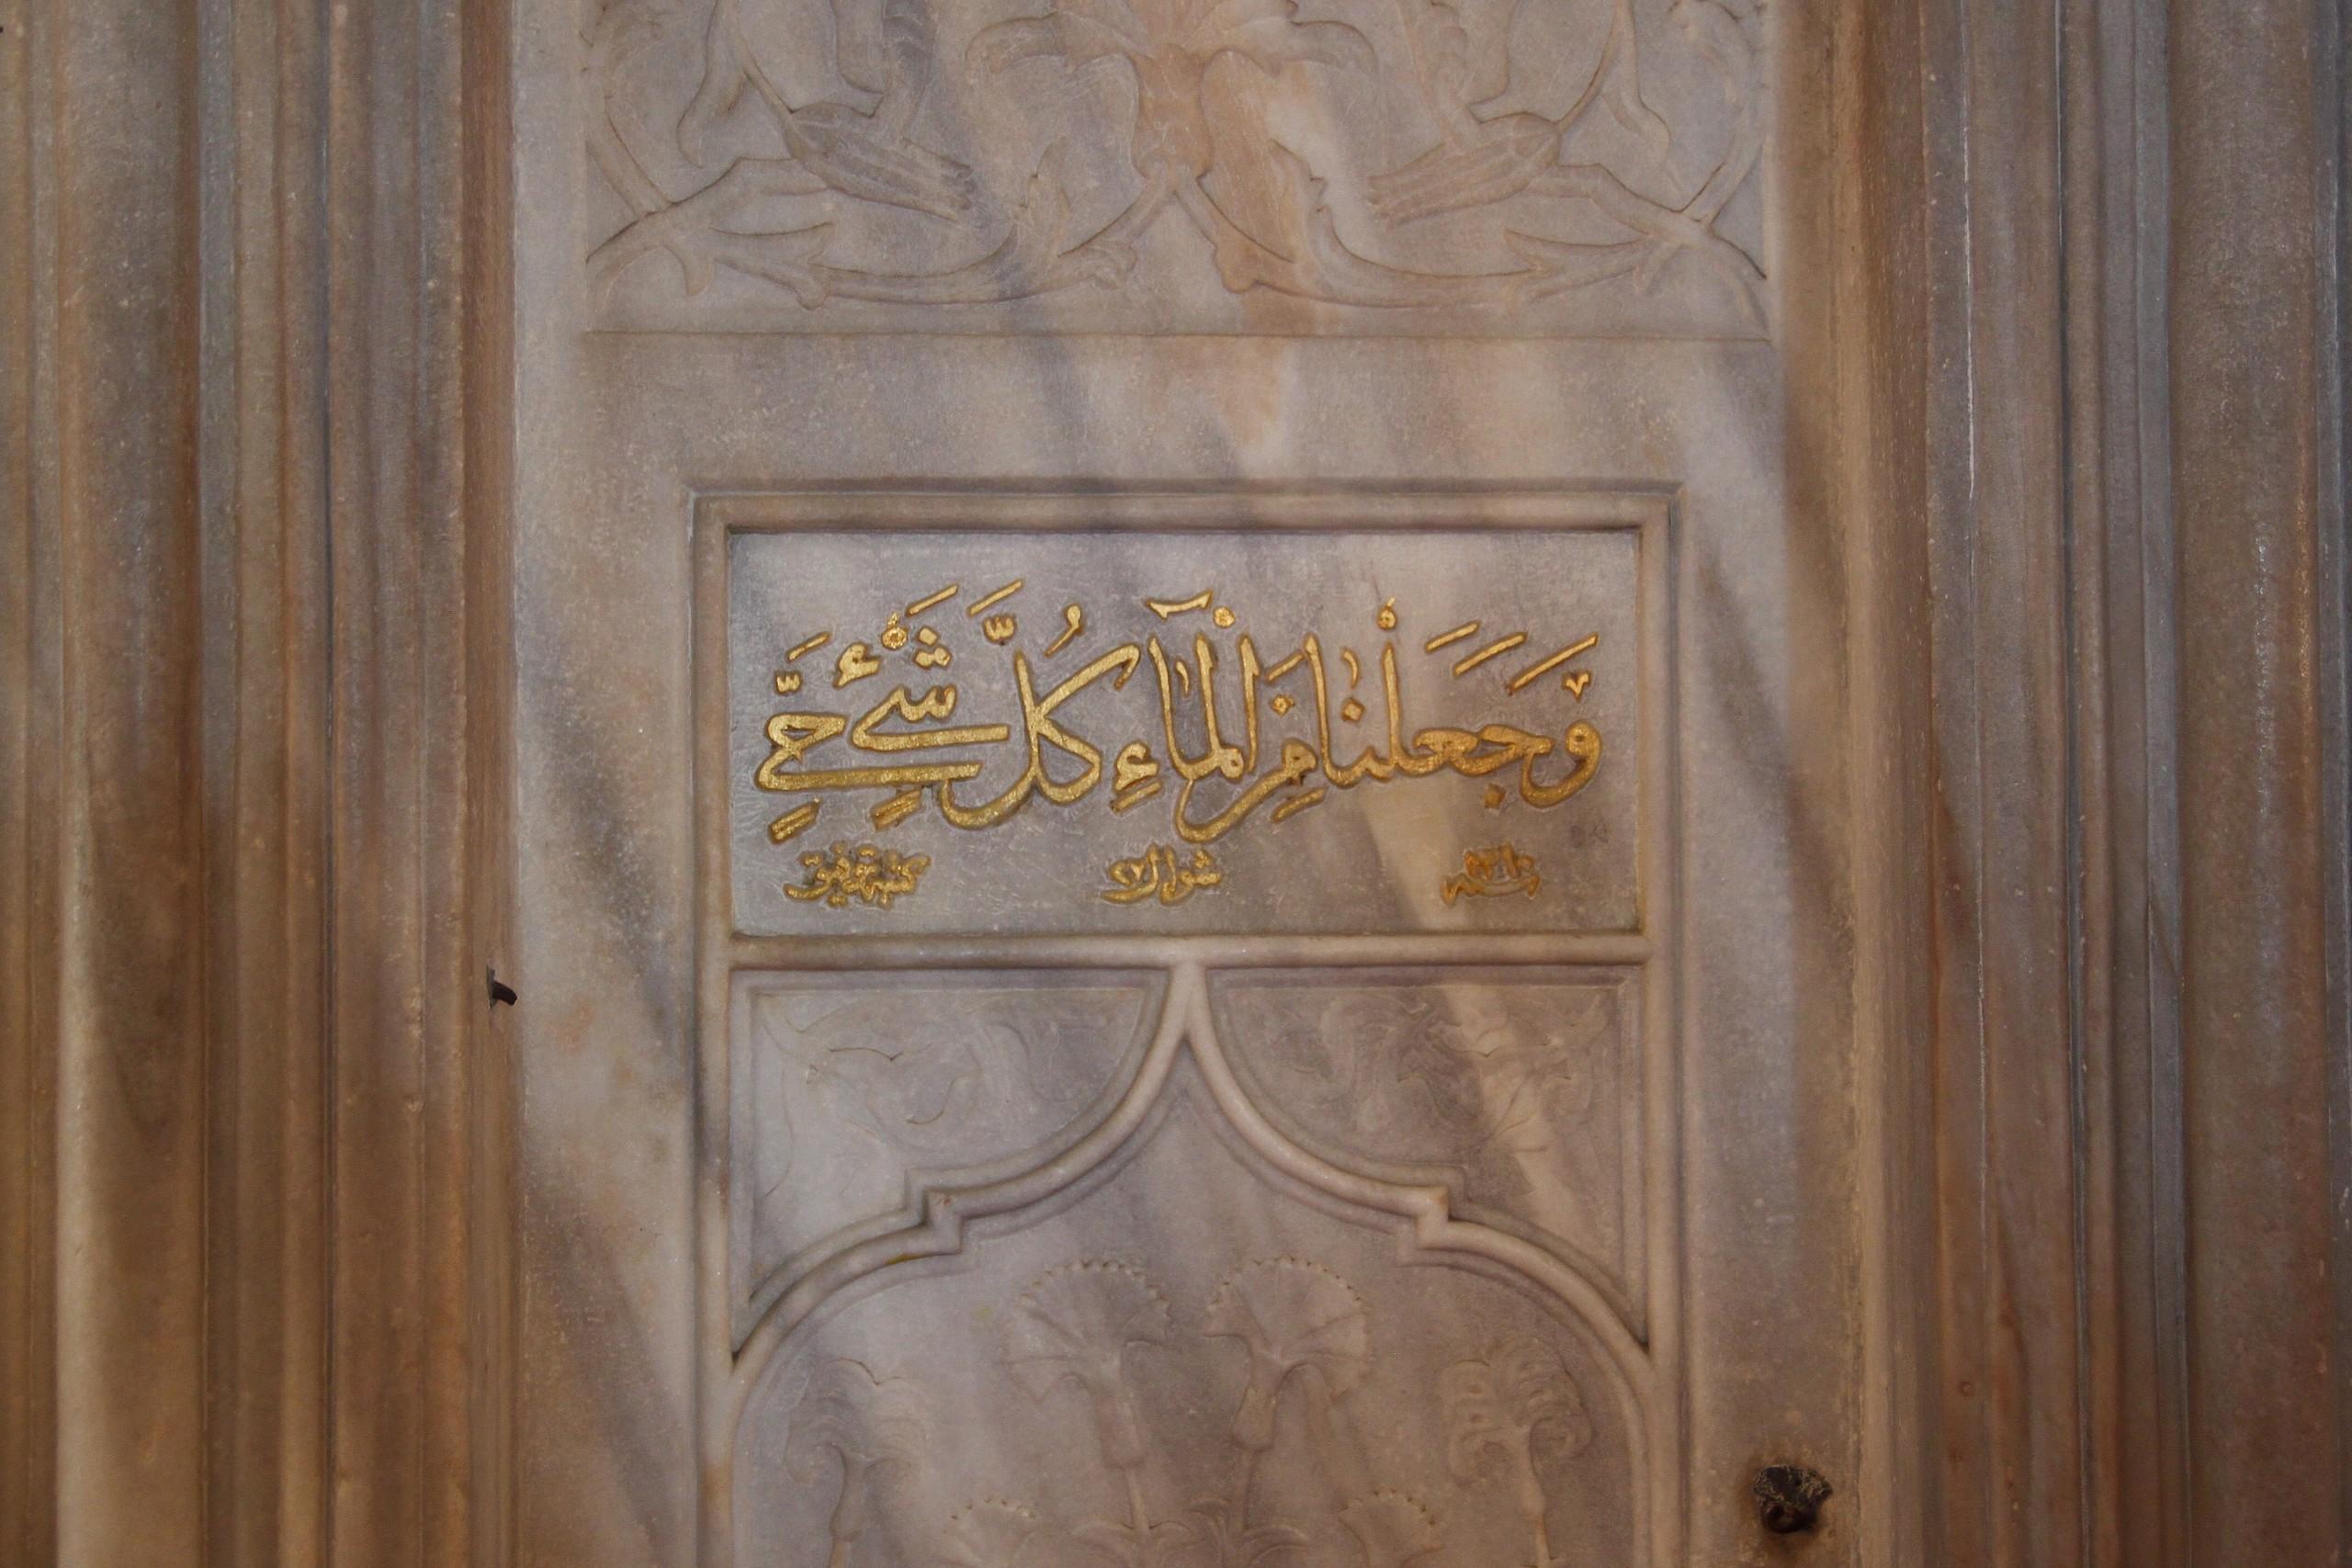 Pırlantadan Kubbeler #5: Sultanahmed - r9X7Y1 - Pırlantadan Kubbeler #5: Sultanahmed